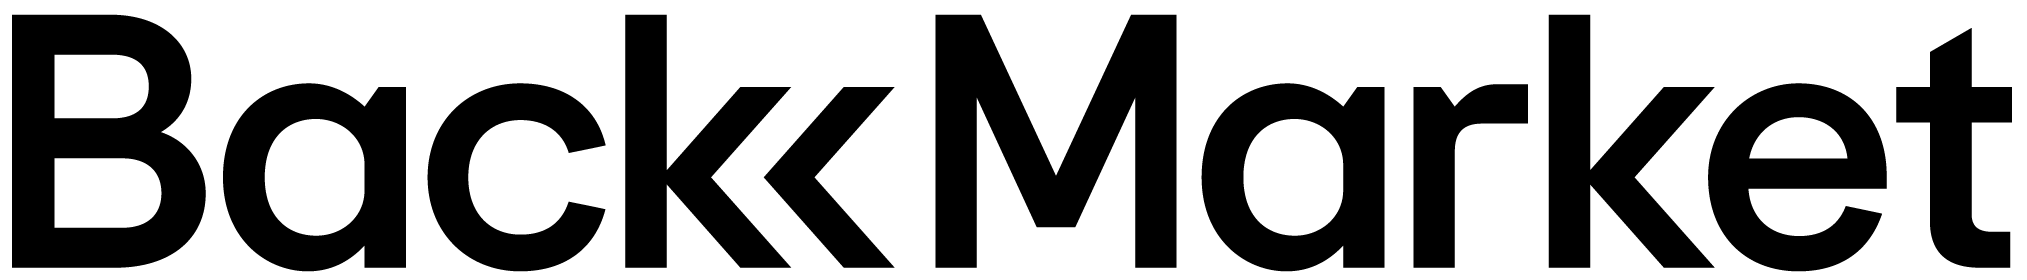 Back_Market-aspect-ratio-x